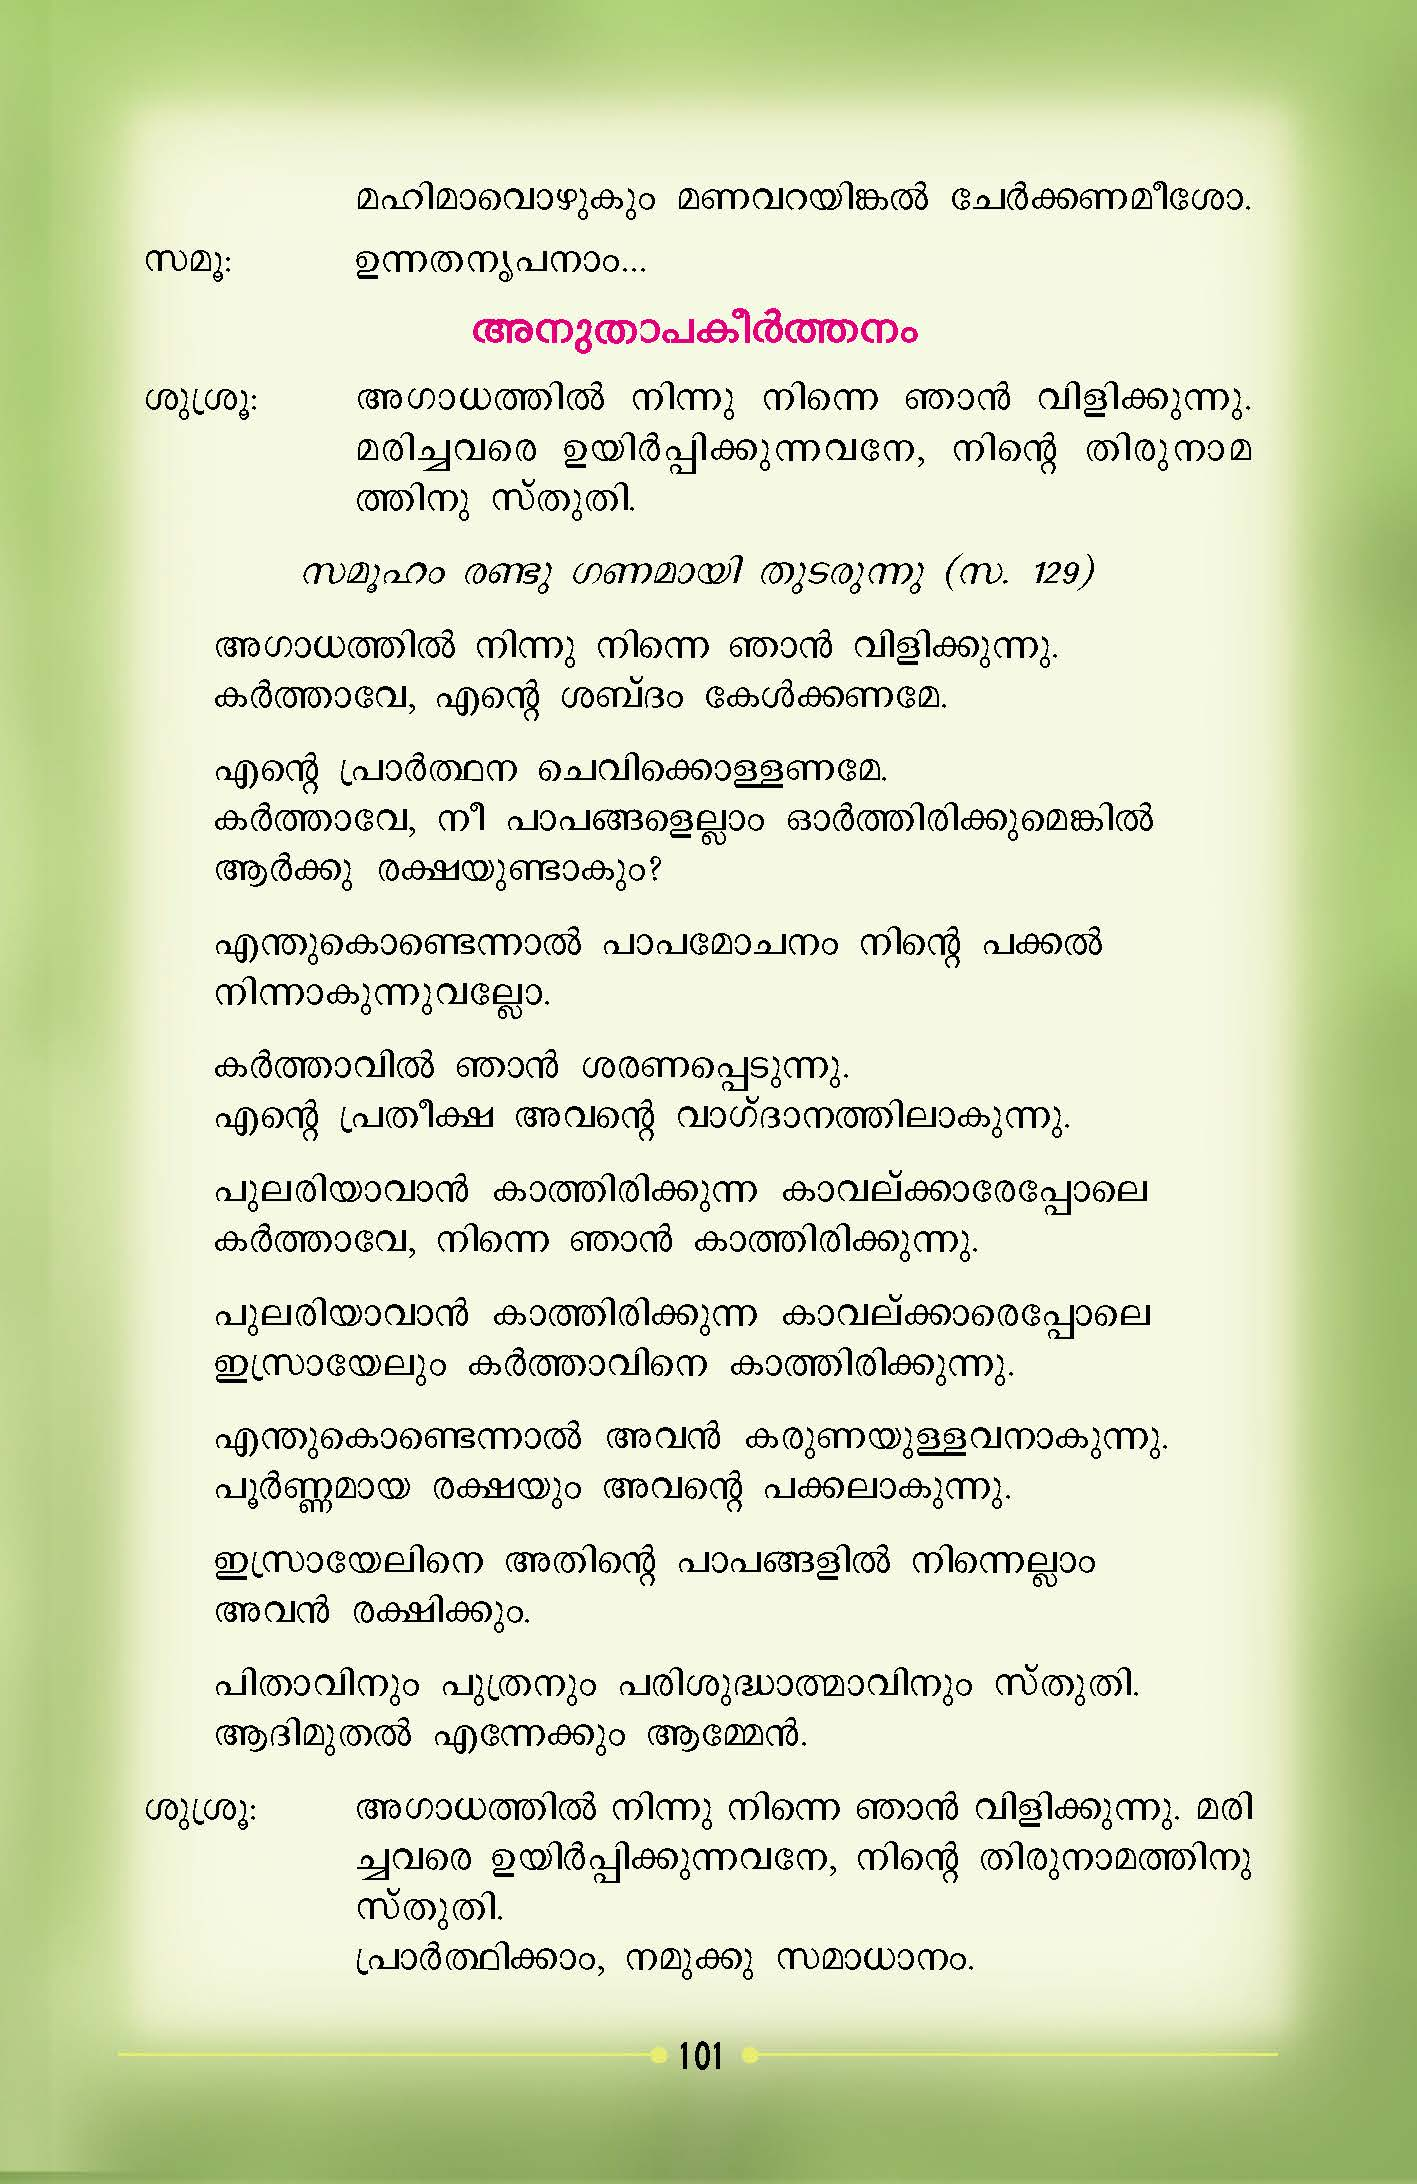 Cheriya Oppesu Office for the Dead (Malayalam) 04